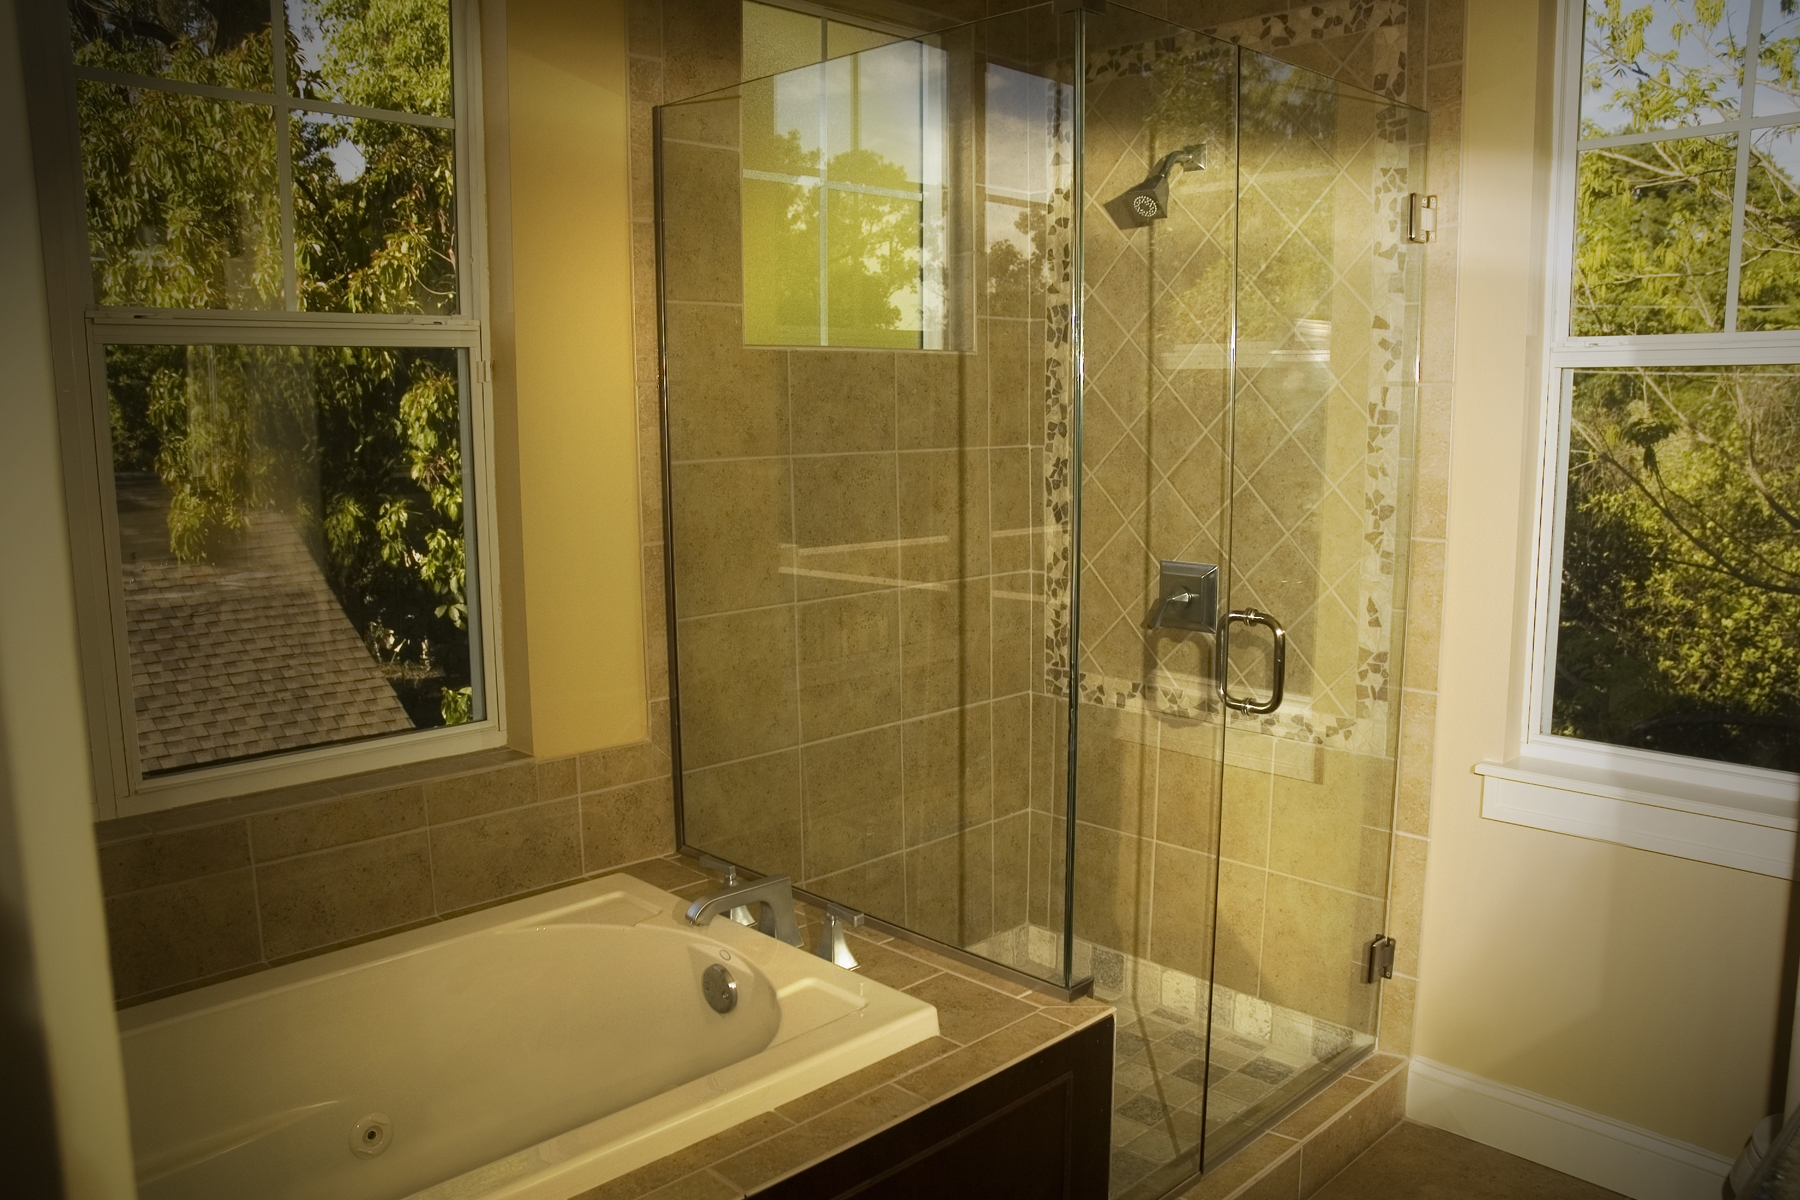 Award winning narrow lot house plan 44037td 2nd floor for Small bathroom design awards